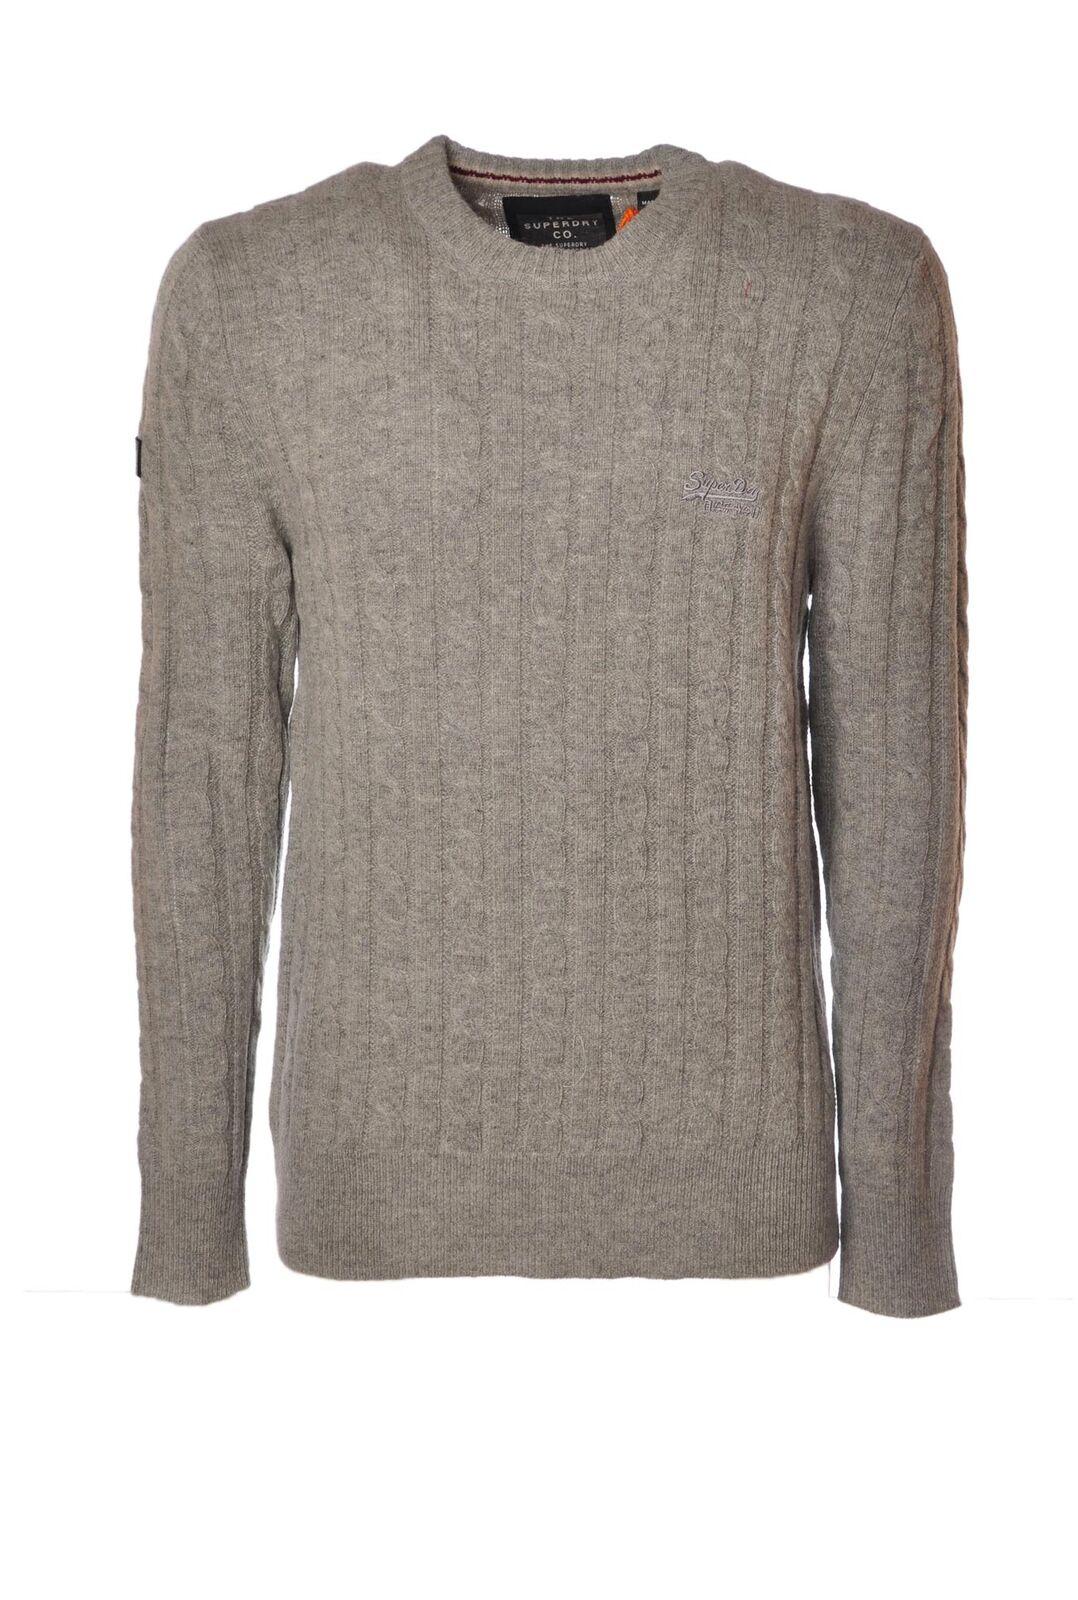 Superdry  -  Sweaters - Male - Grau - 4348126A184533